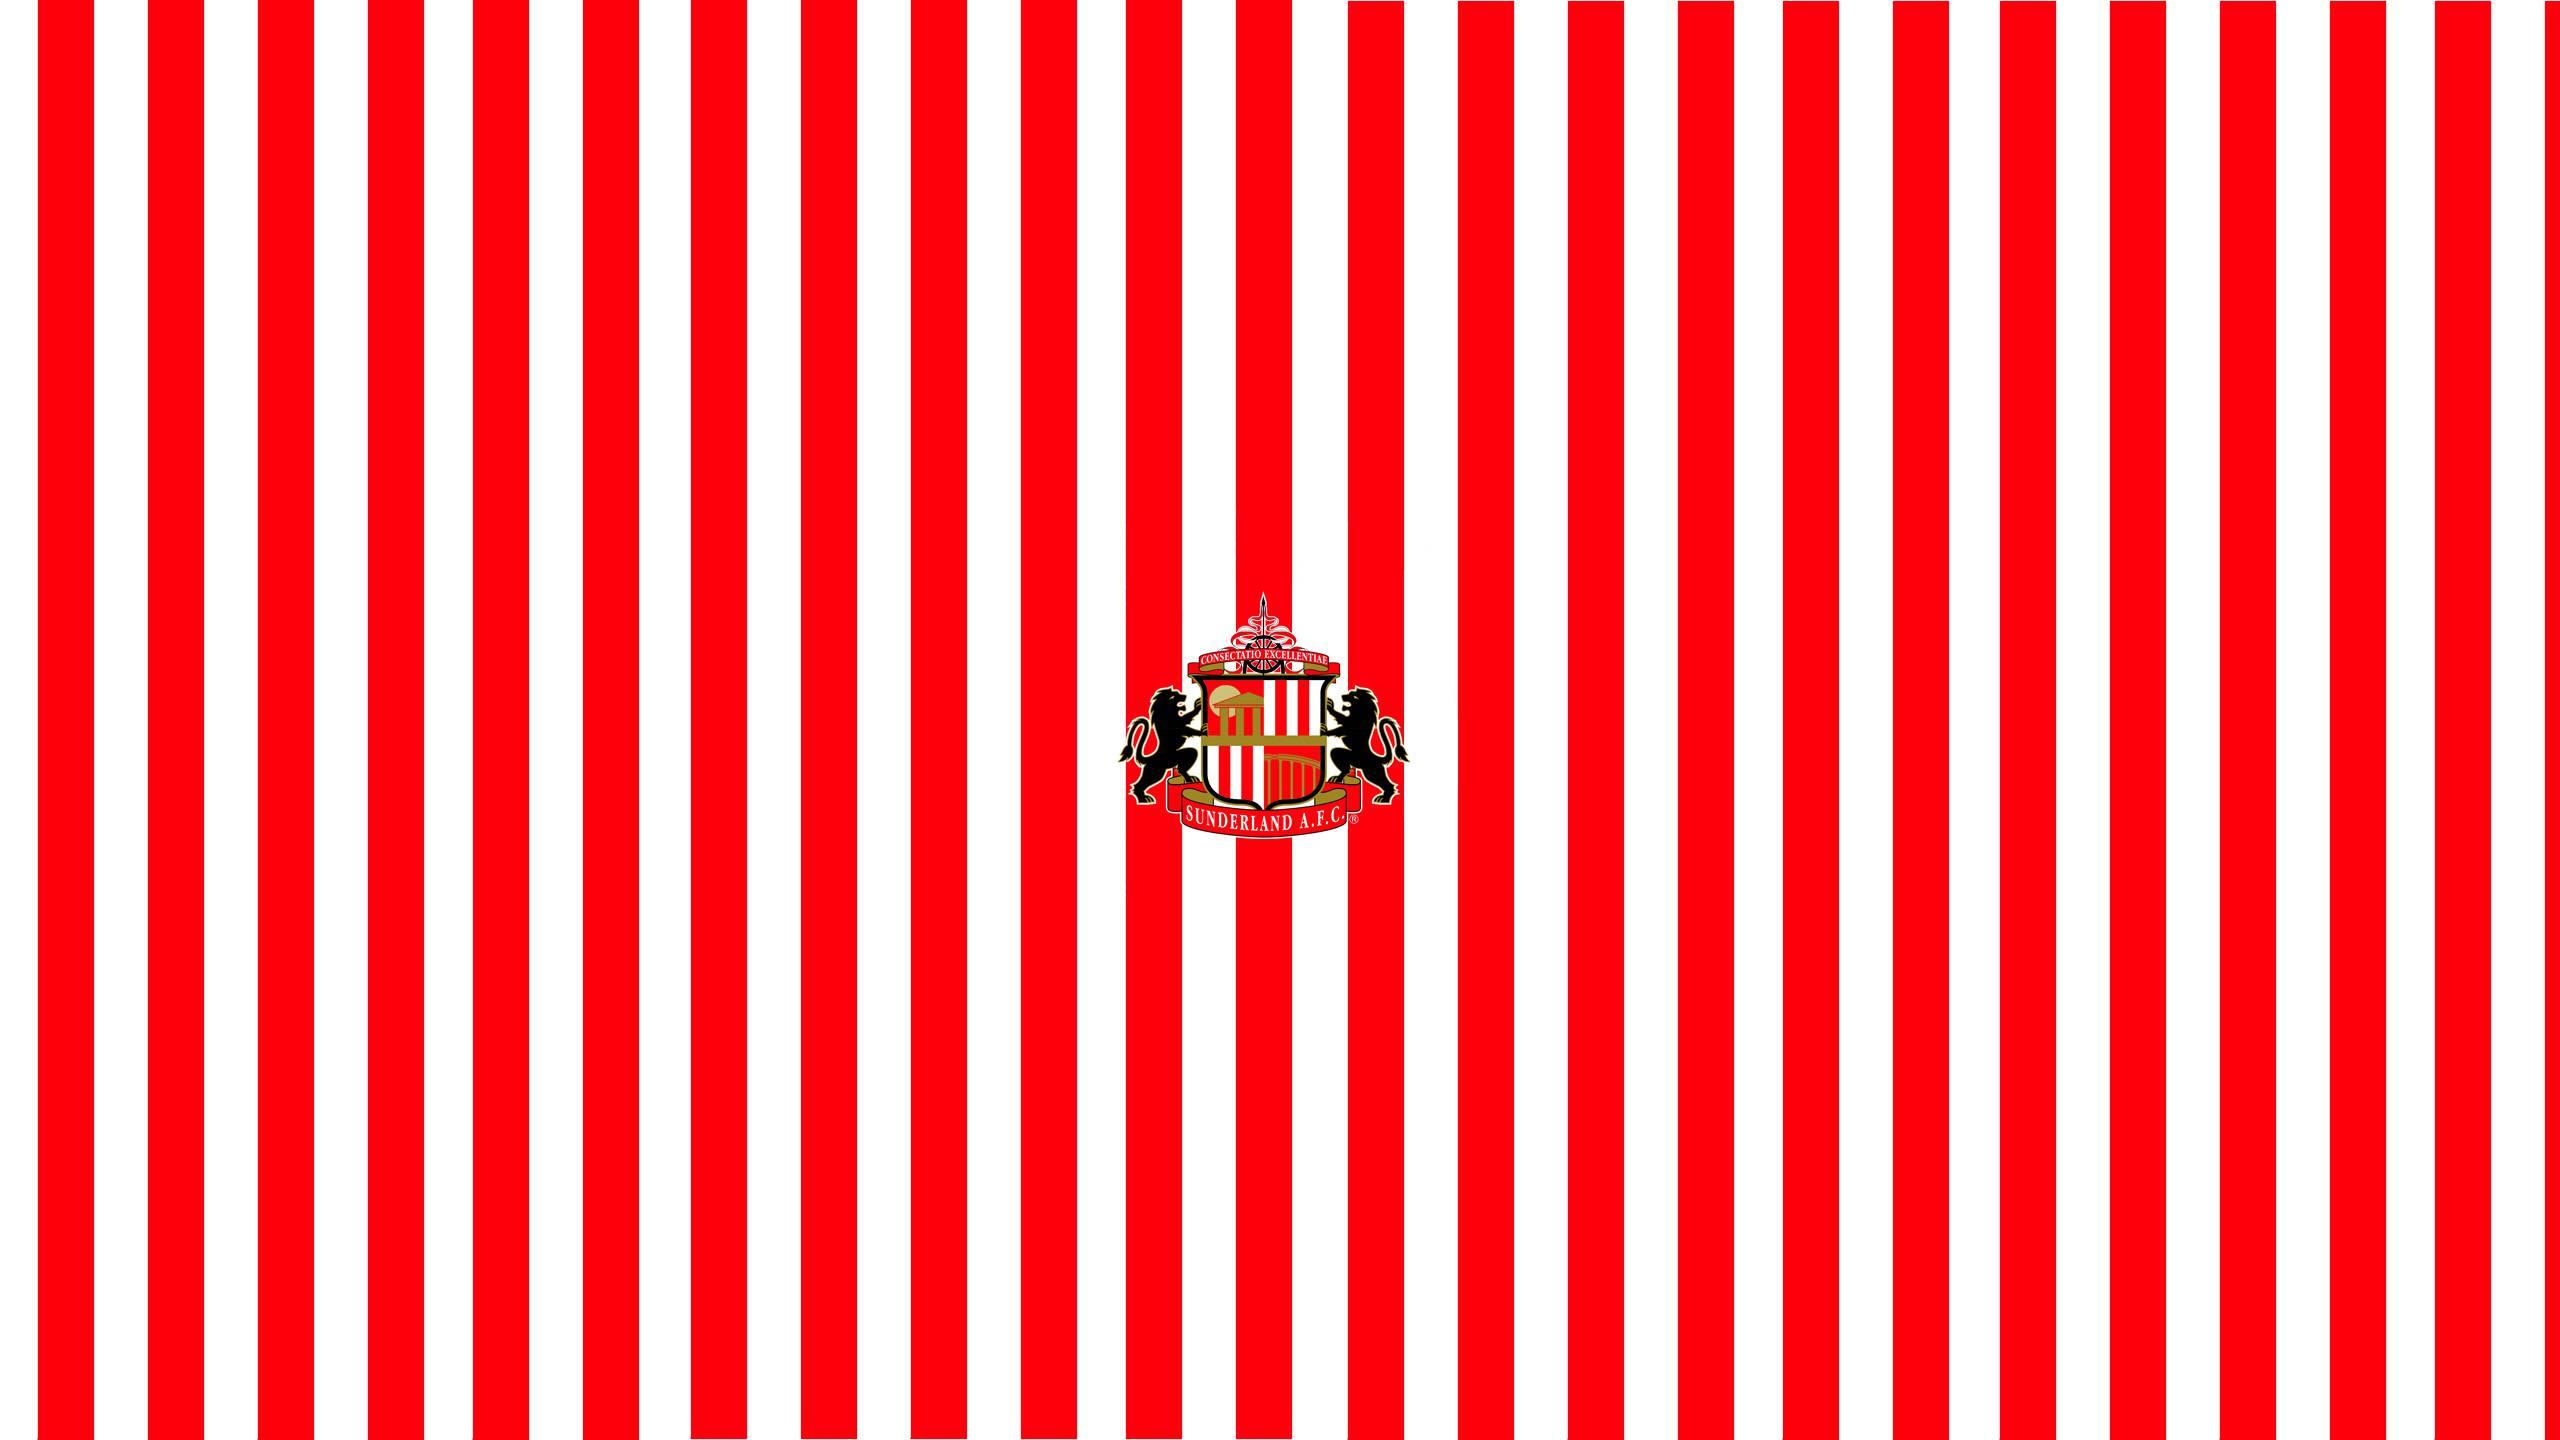 96] Sunderland Wallpapers on WallpaperSafari 2560x1440